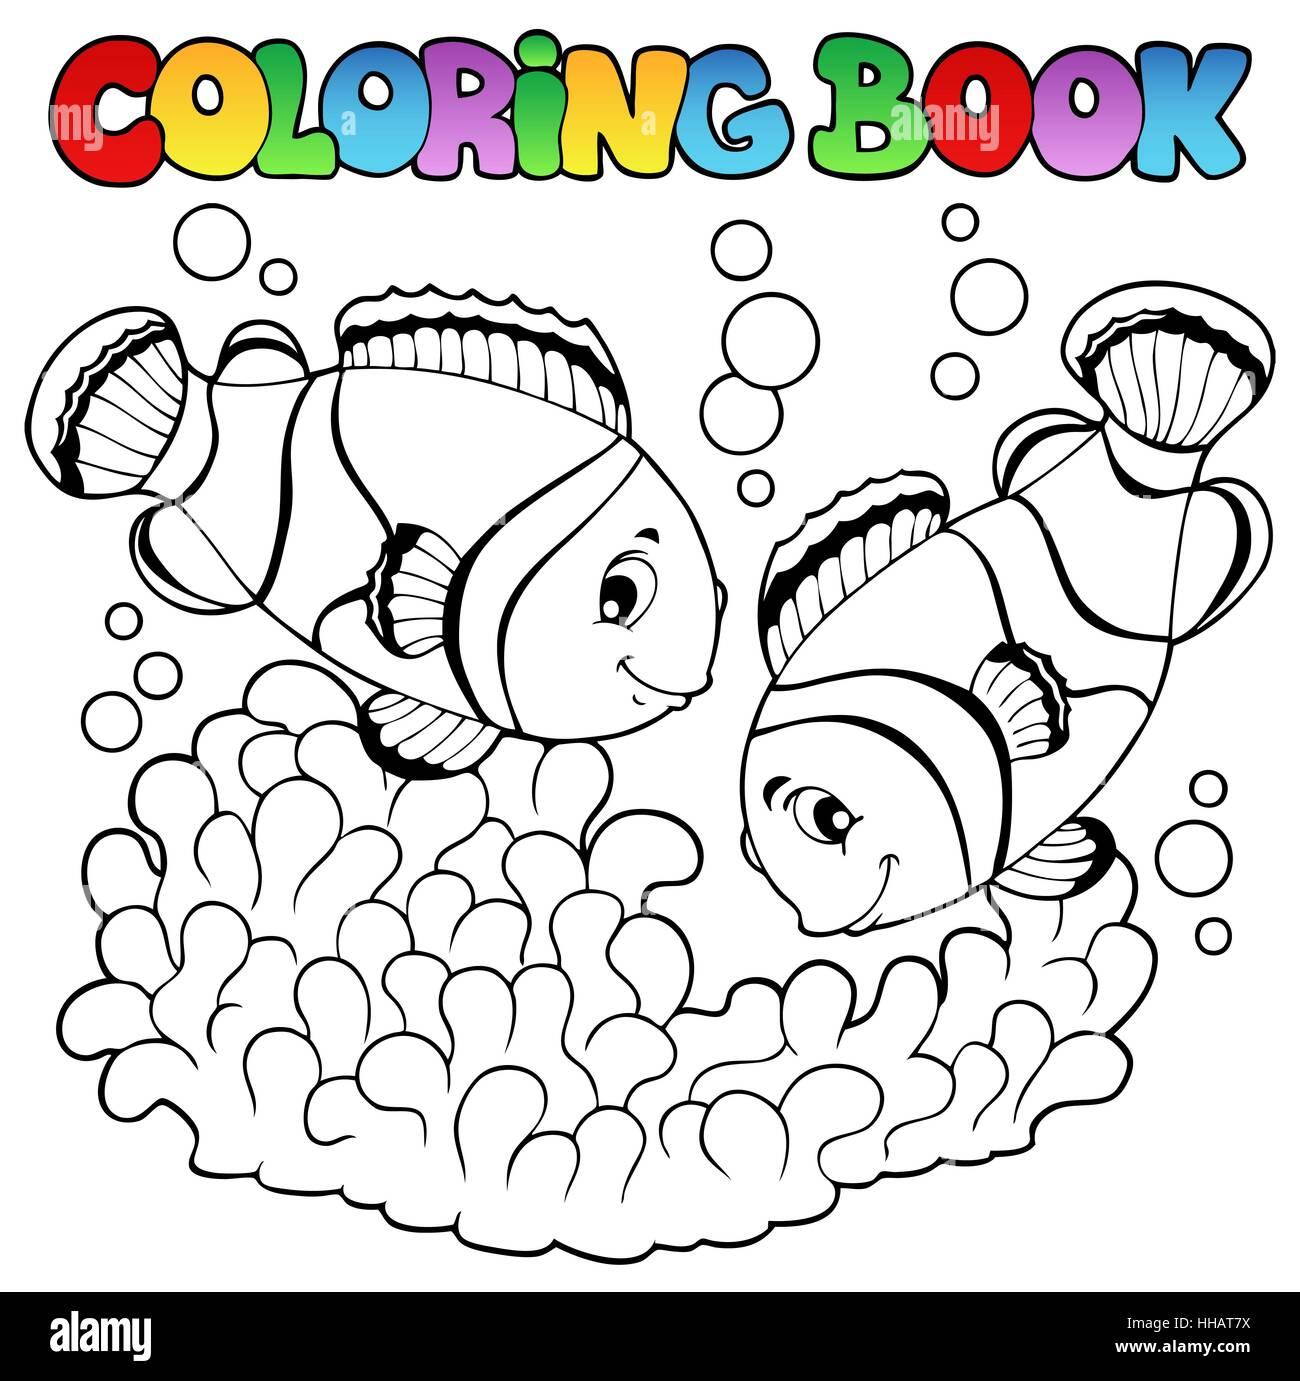 colour, fish, clown, paint, painted, colouring, book, art, colour, graphic, - Stock Image